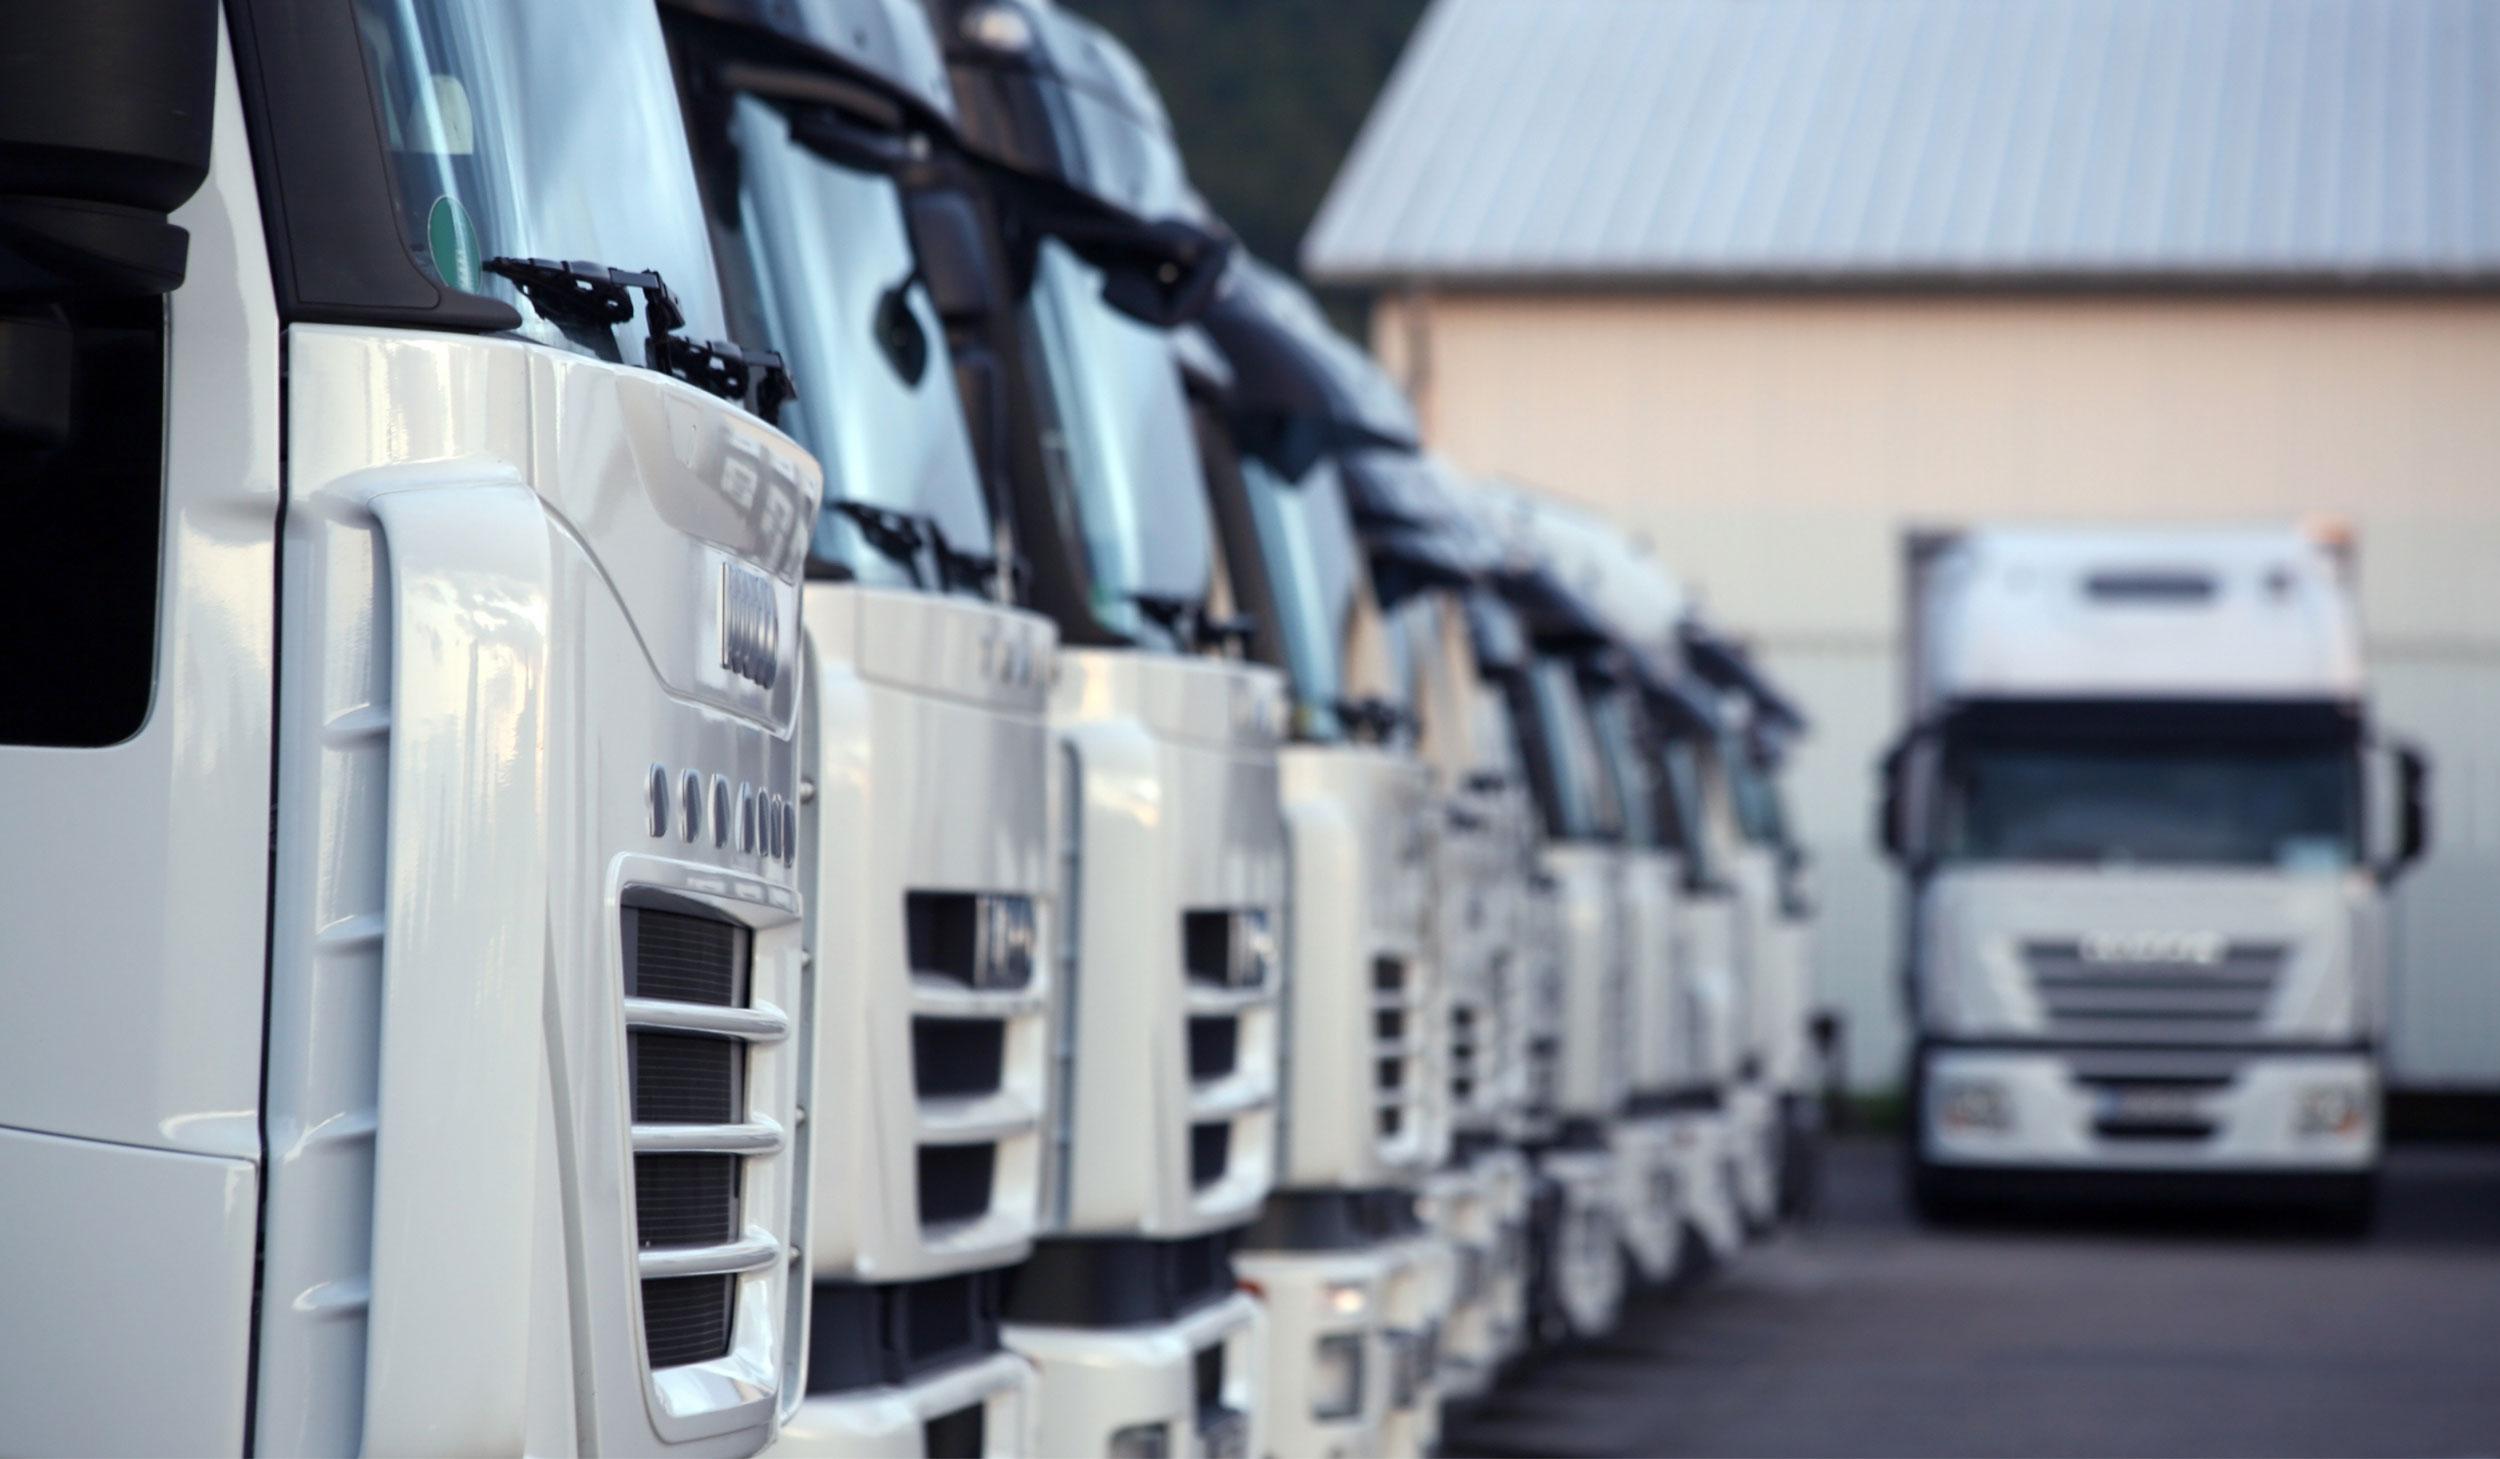 Backes & Backes Rechtsanwälte Verkehrsrecht / Fuhrparkmanagement